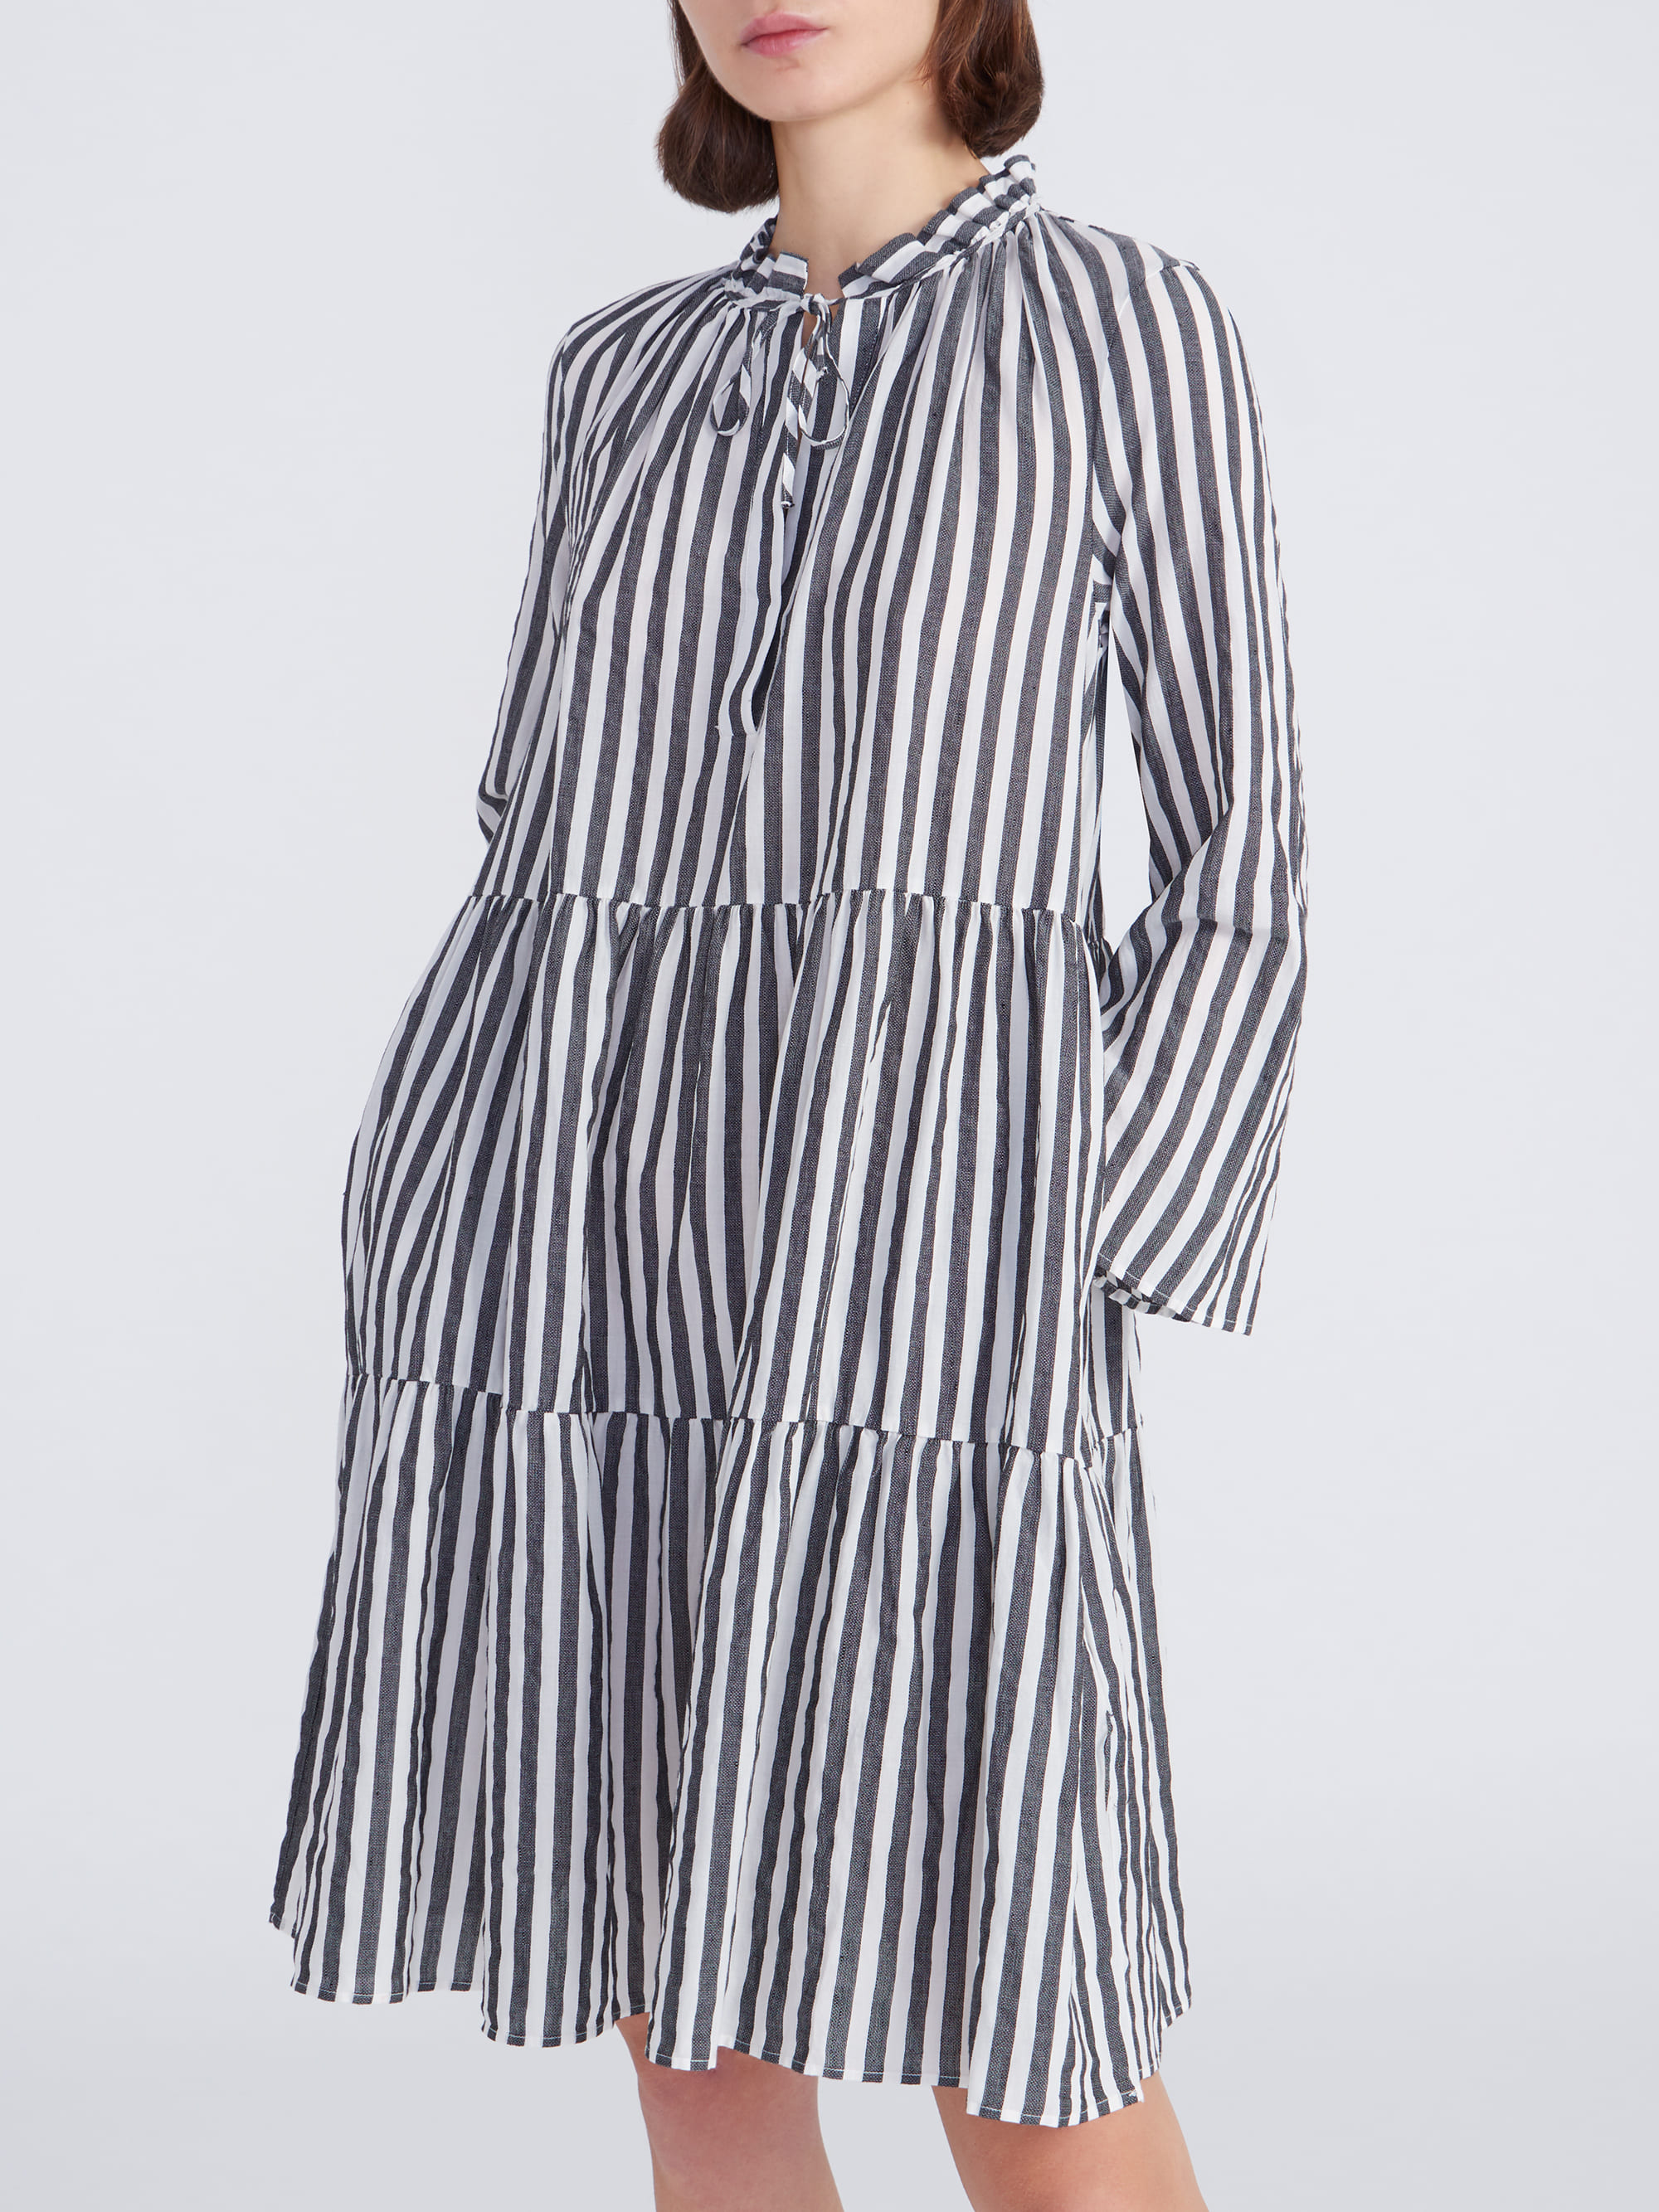 Kleid Milly Stripes Grau